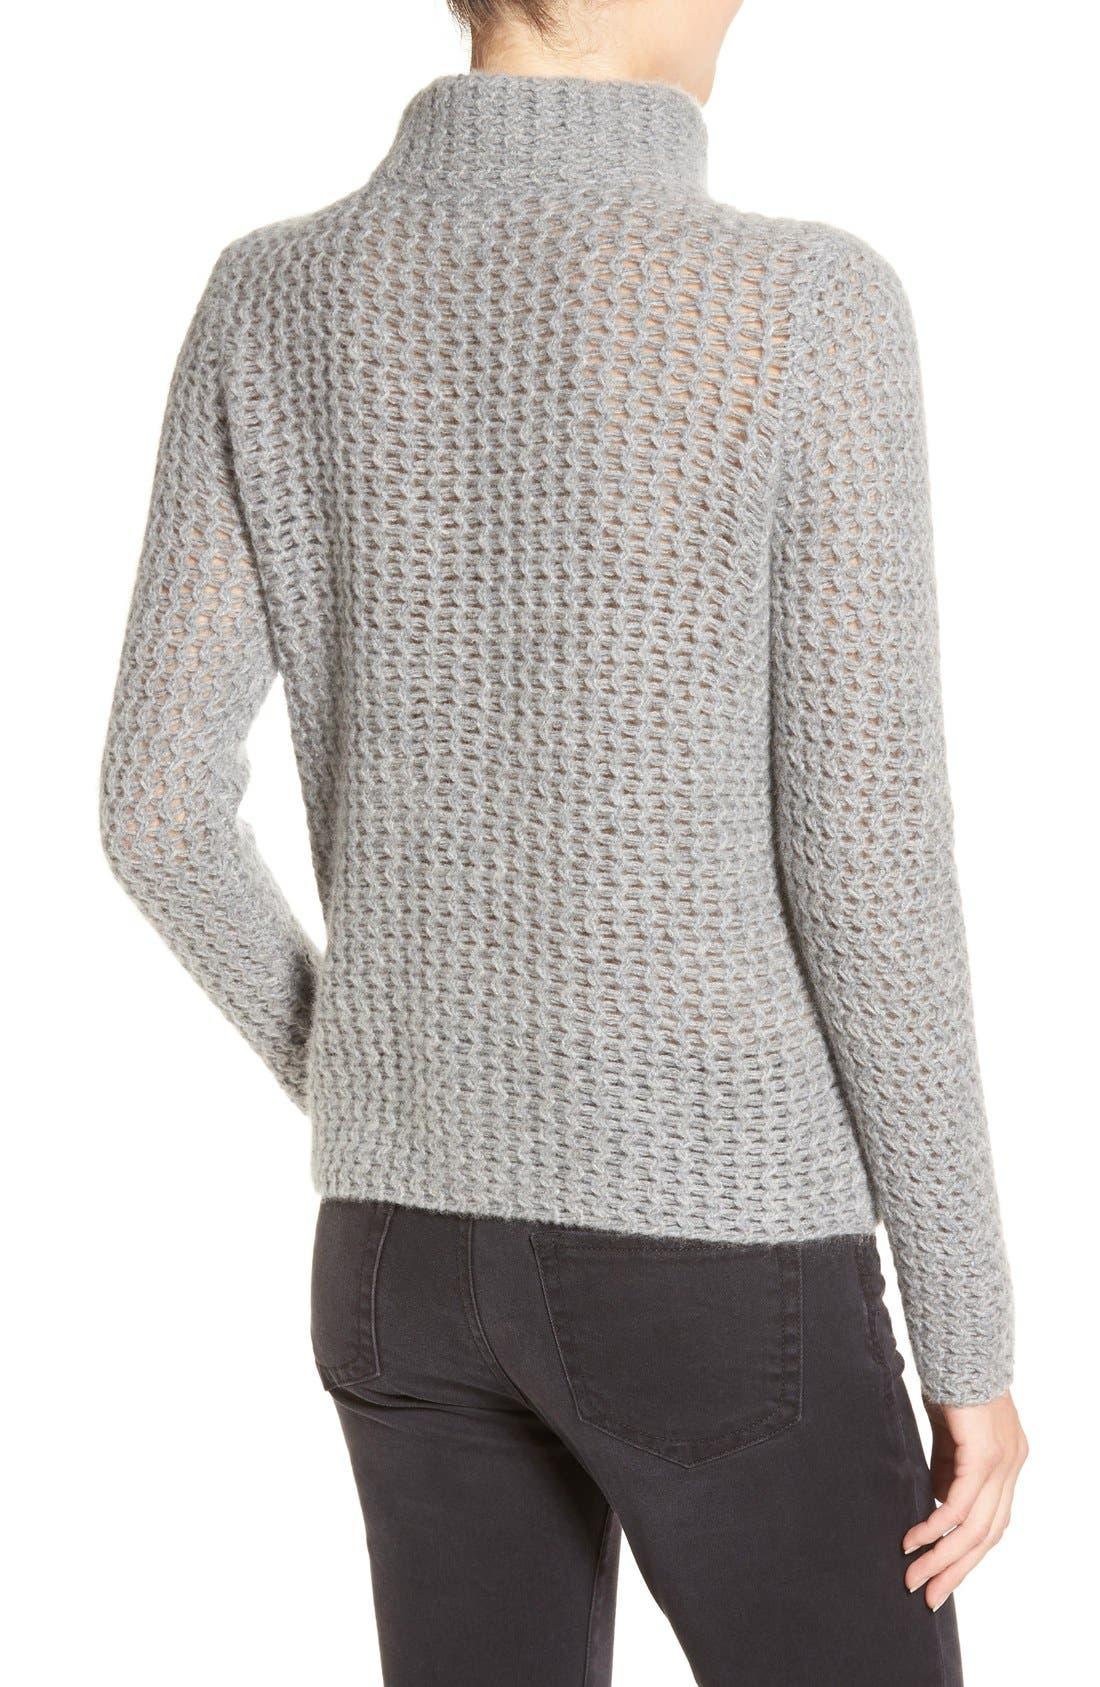 Stitch Detail Cashmere Mock Neck Sweater,                             Alternate thumbnail 3, color,                             030